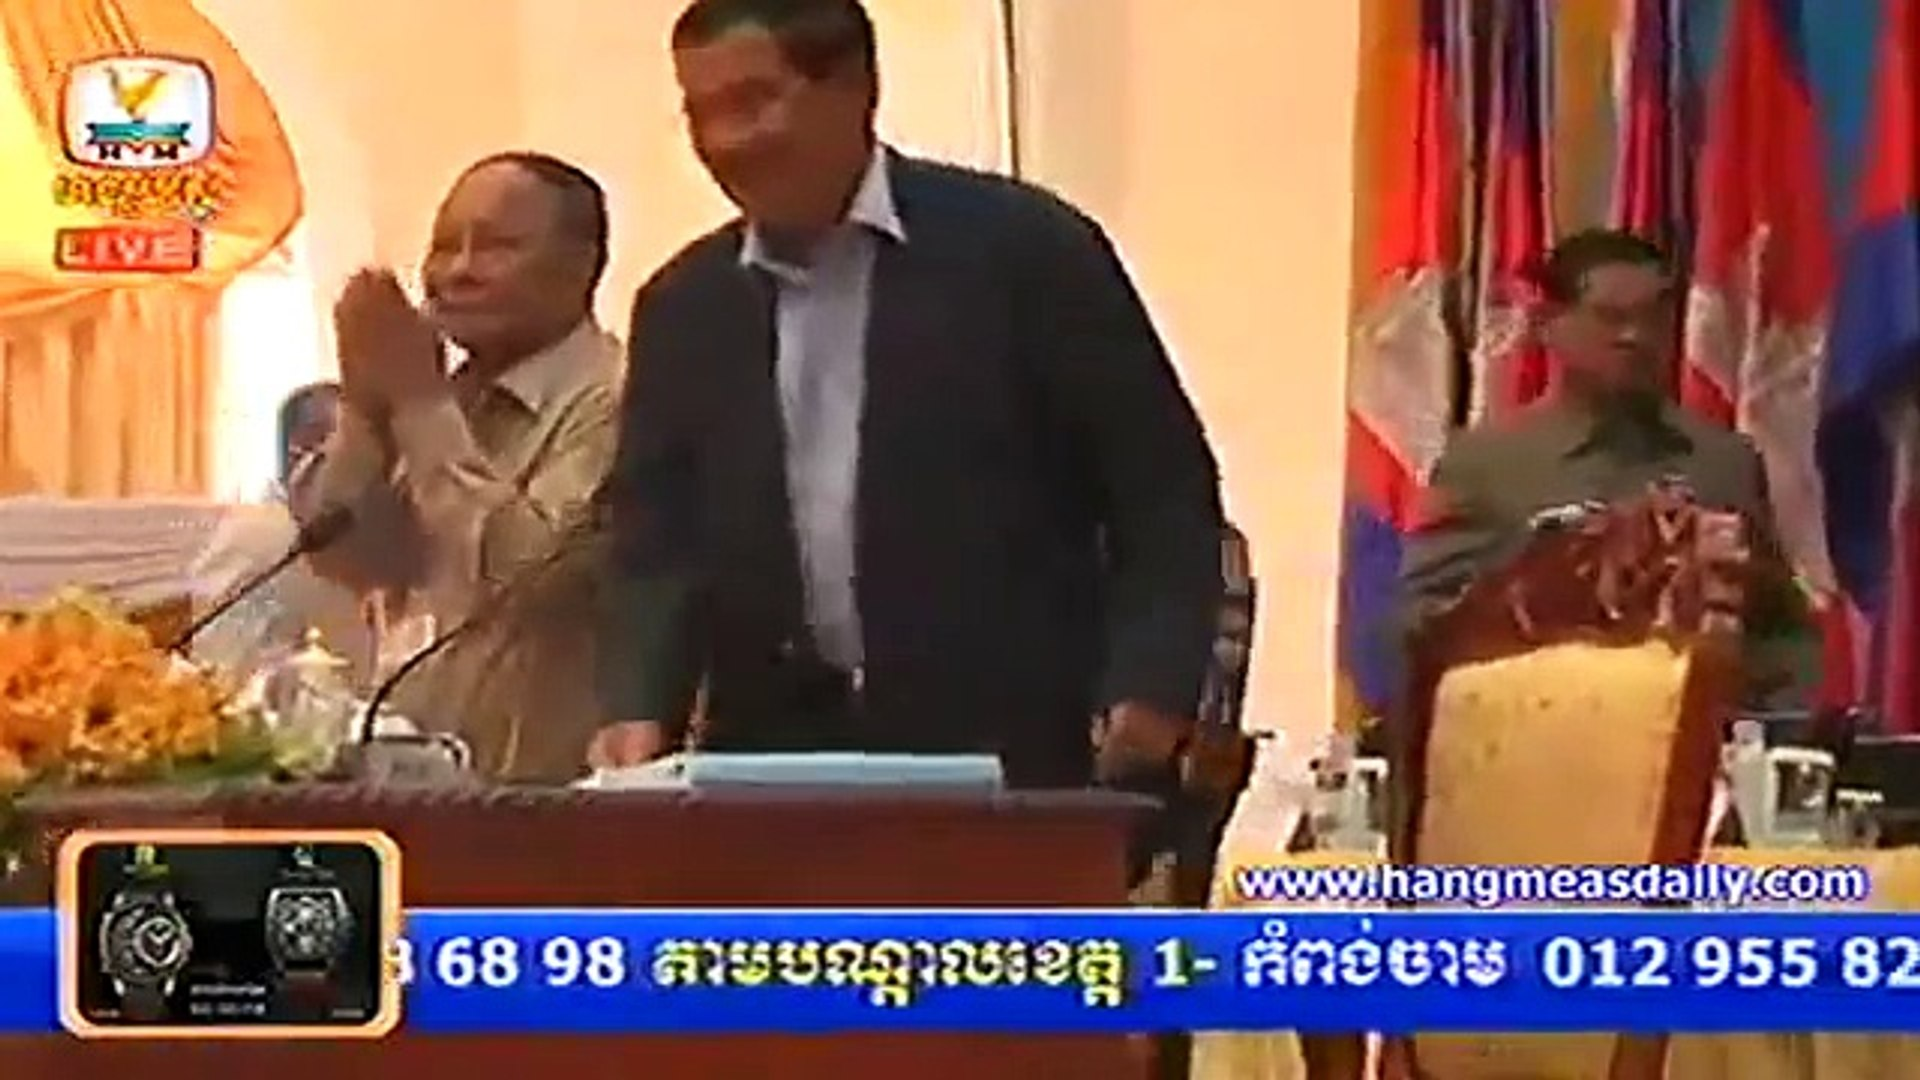 khmer news 2016-hang meas news 17 march 2016-hang meas news 2016-cambodia news 2016 3